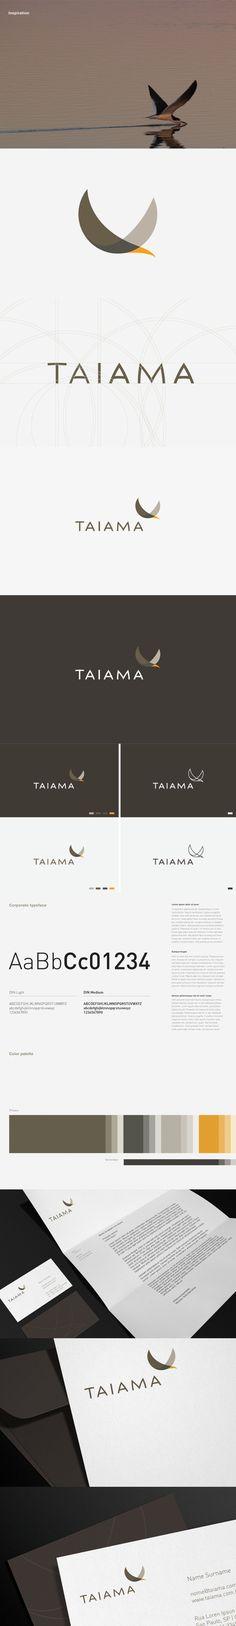 Taiama Logo                                                                                                                                                                                 More